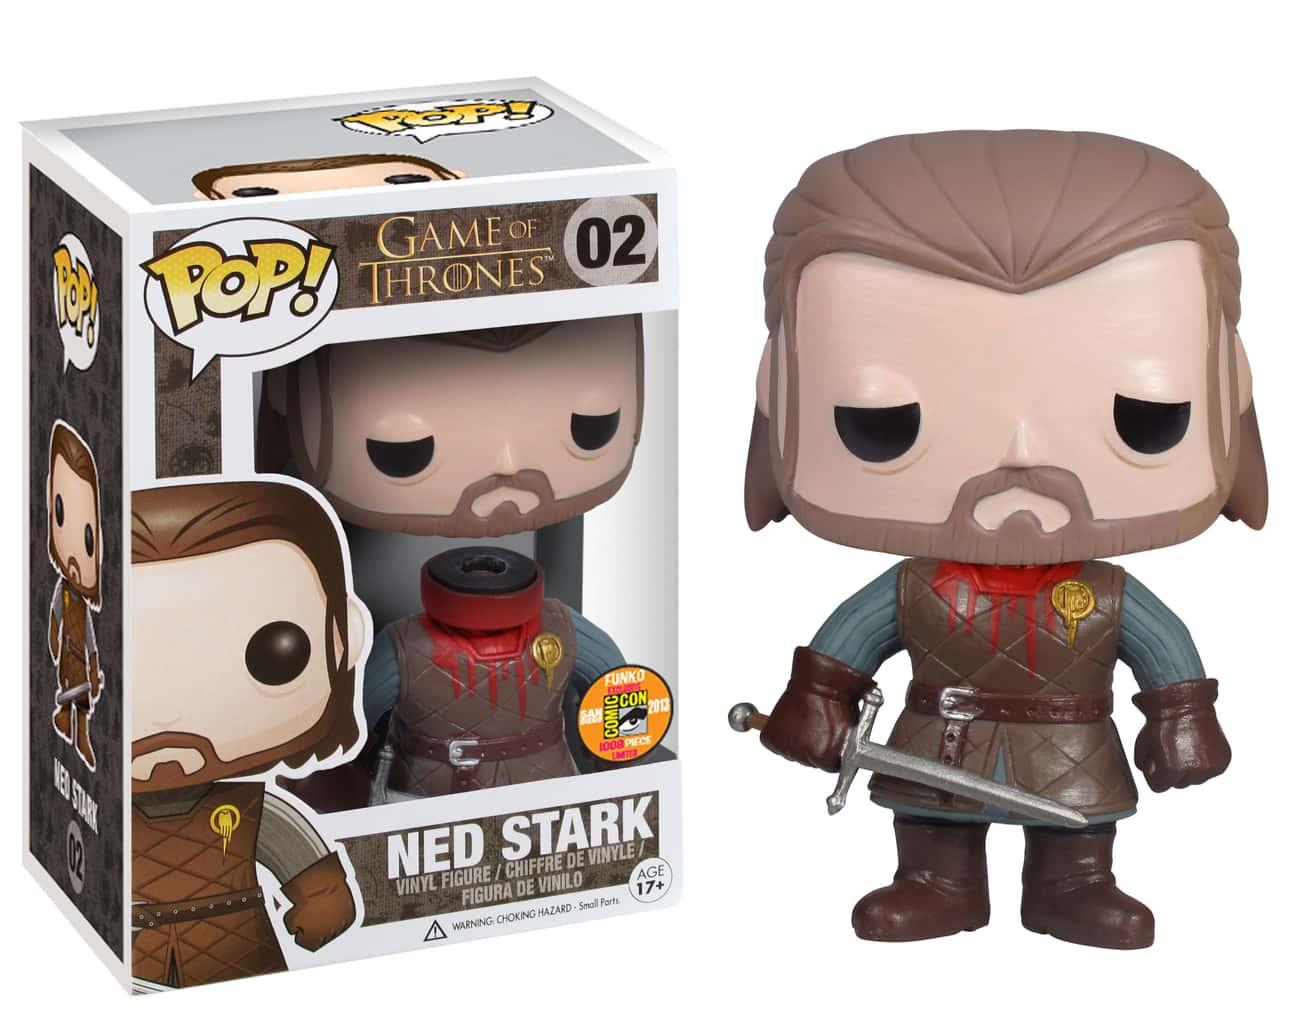 Beheaded Ned Stark (With Detachable Head)